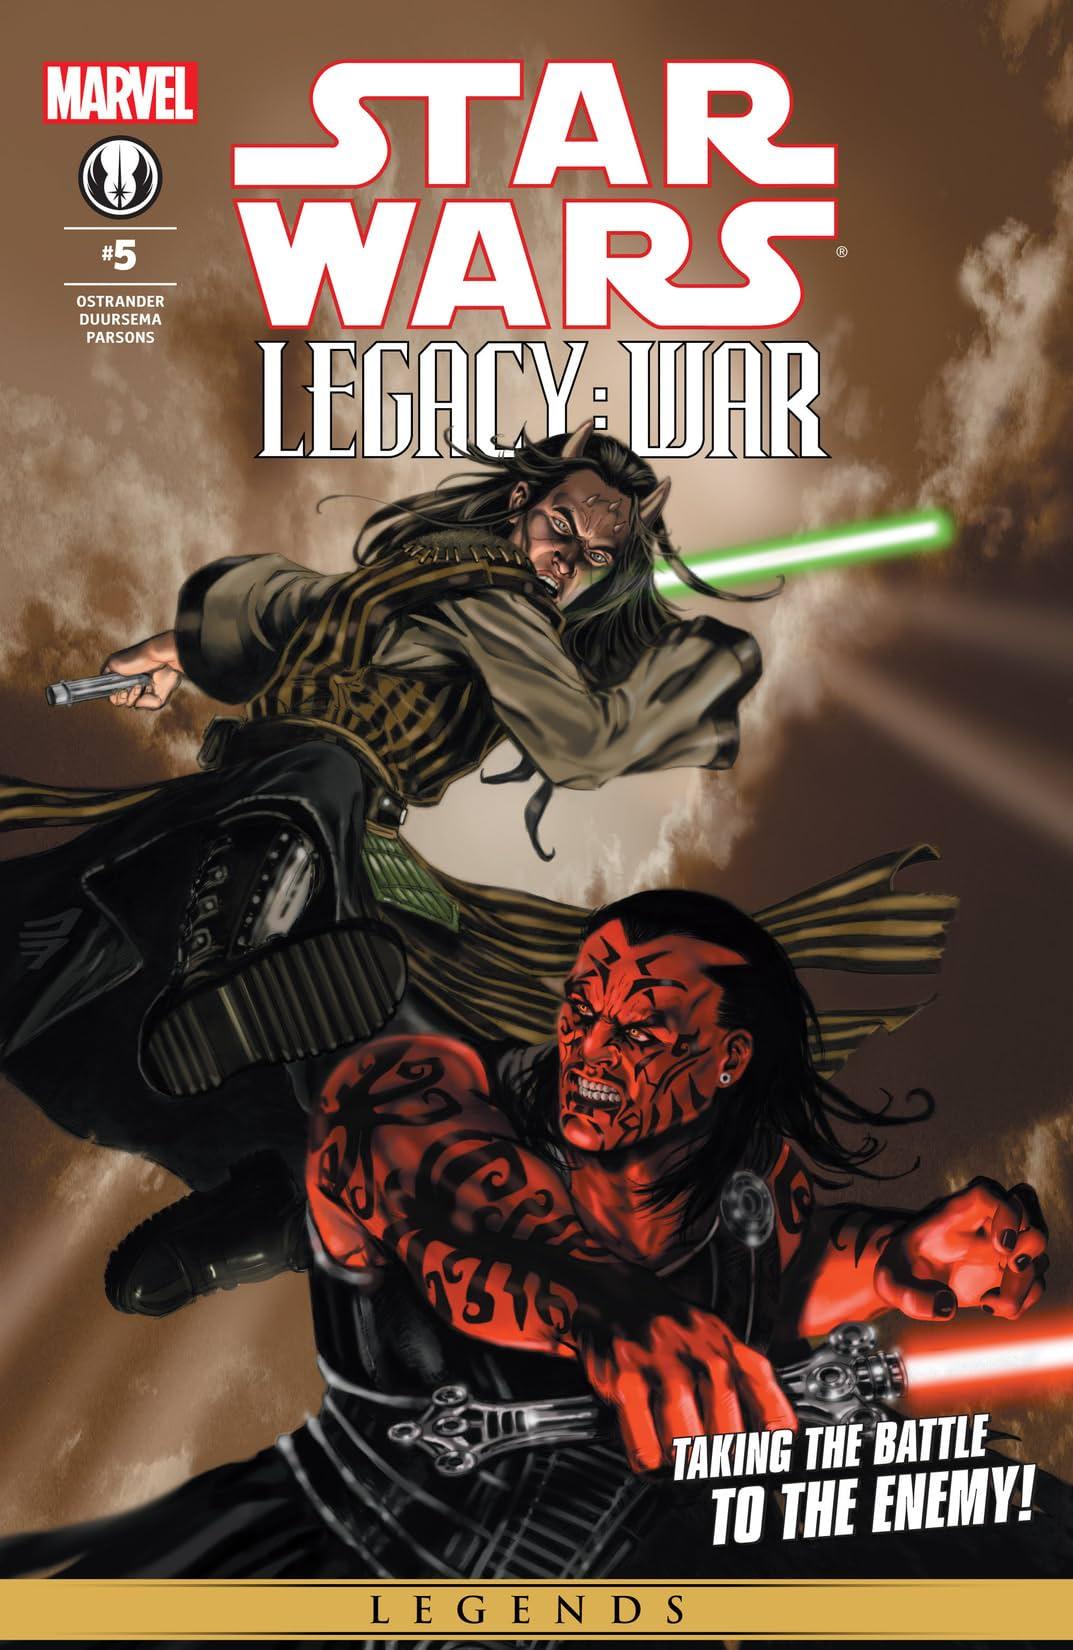 Star Wars: Legacy - War (2010-2011) #5